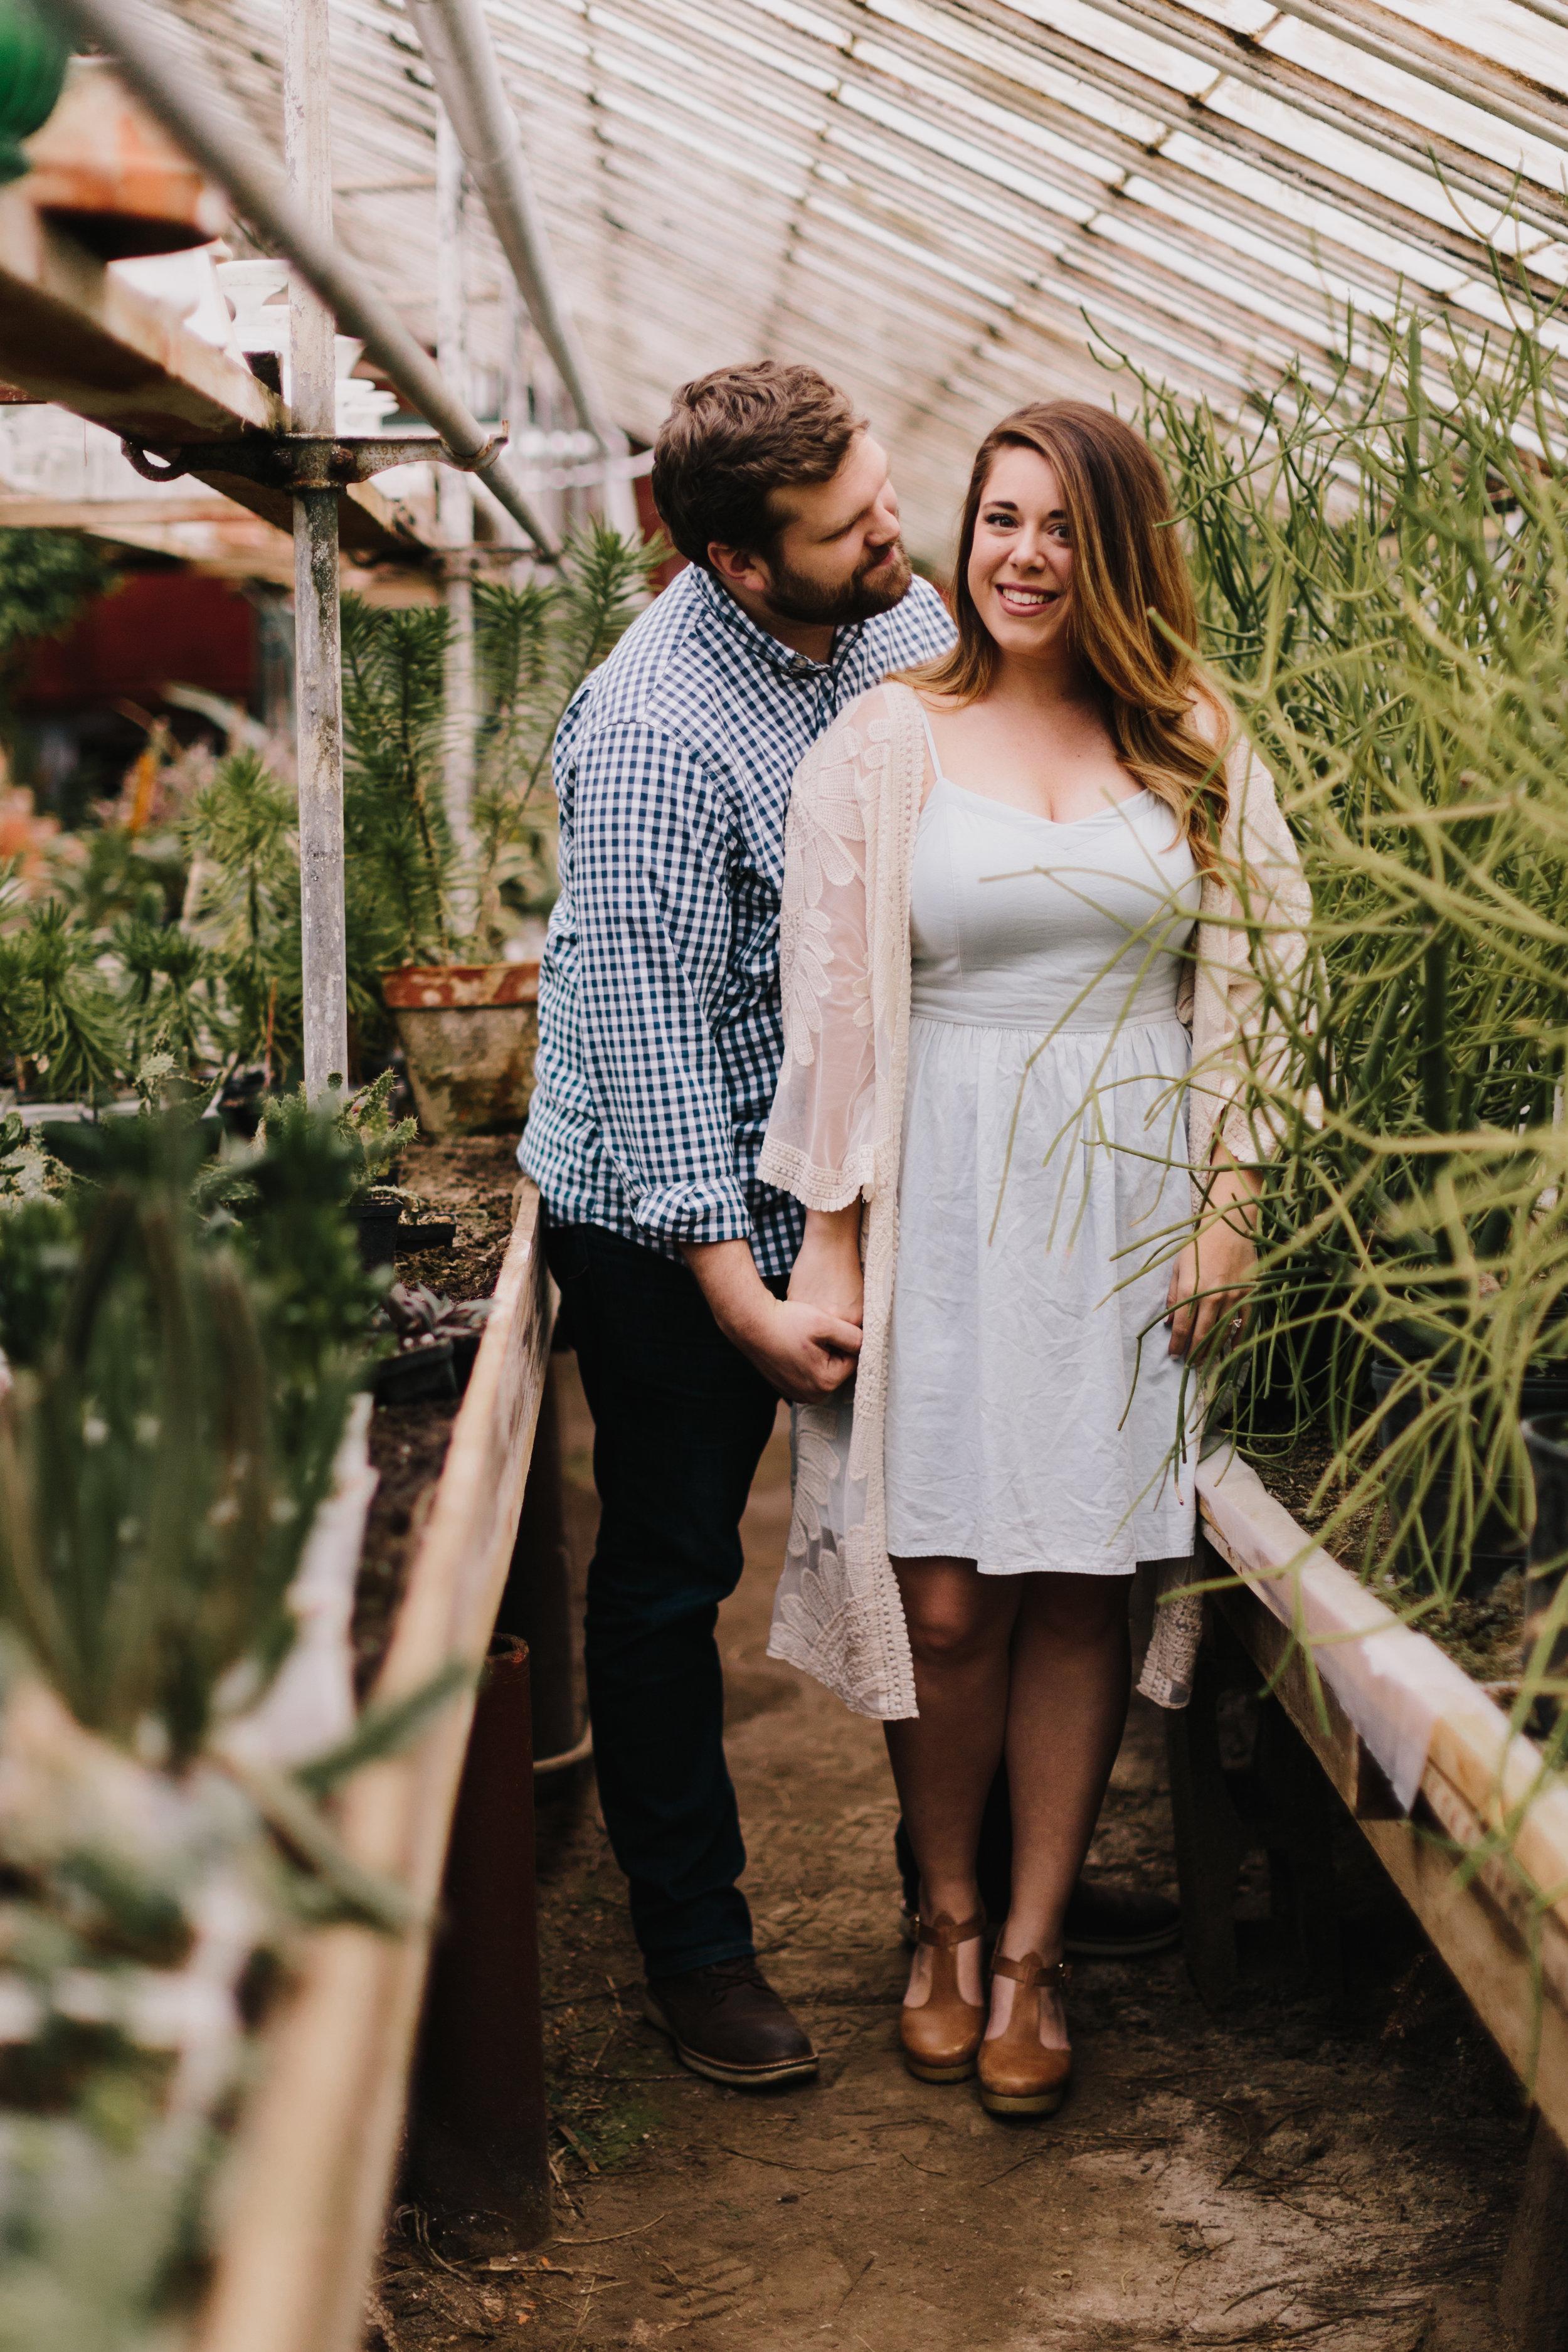 alyssa barletter photography greenhouse engagement photographer kansas city spring wedding-9.jpg